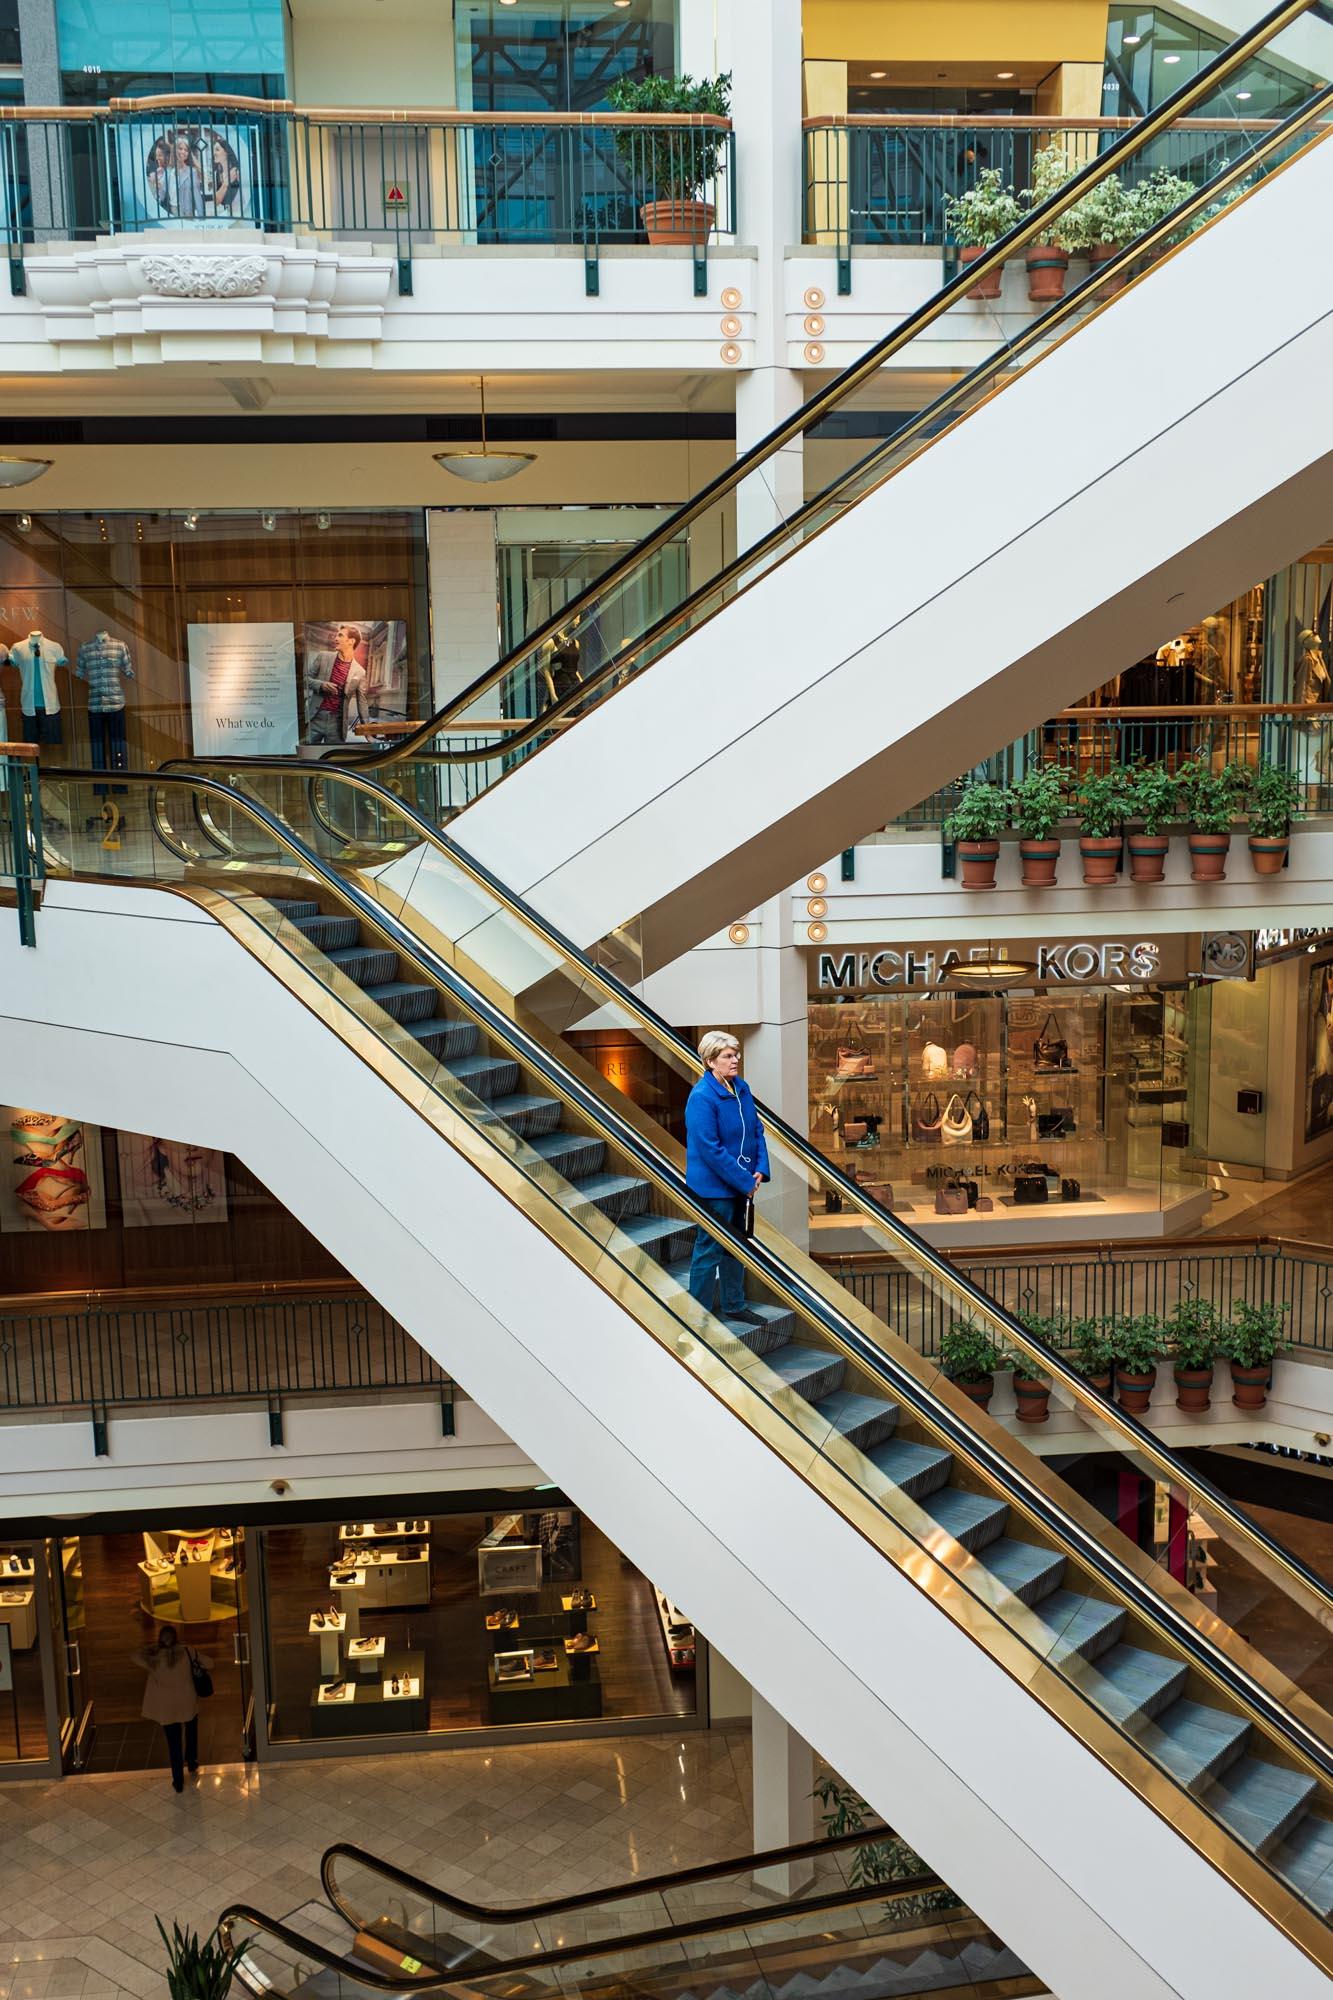 a woman descends an escalator in a mall in downtown Portland, Oregon